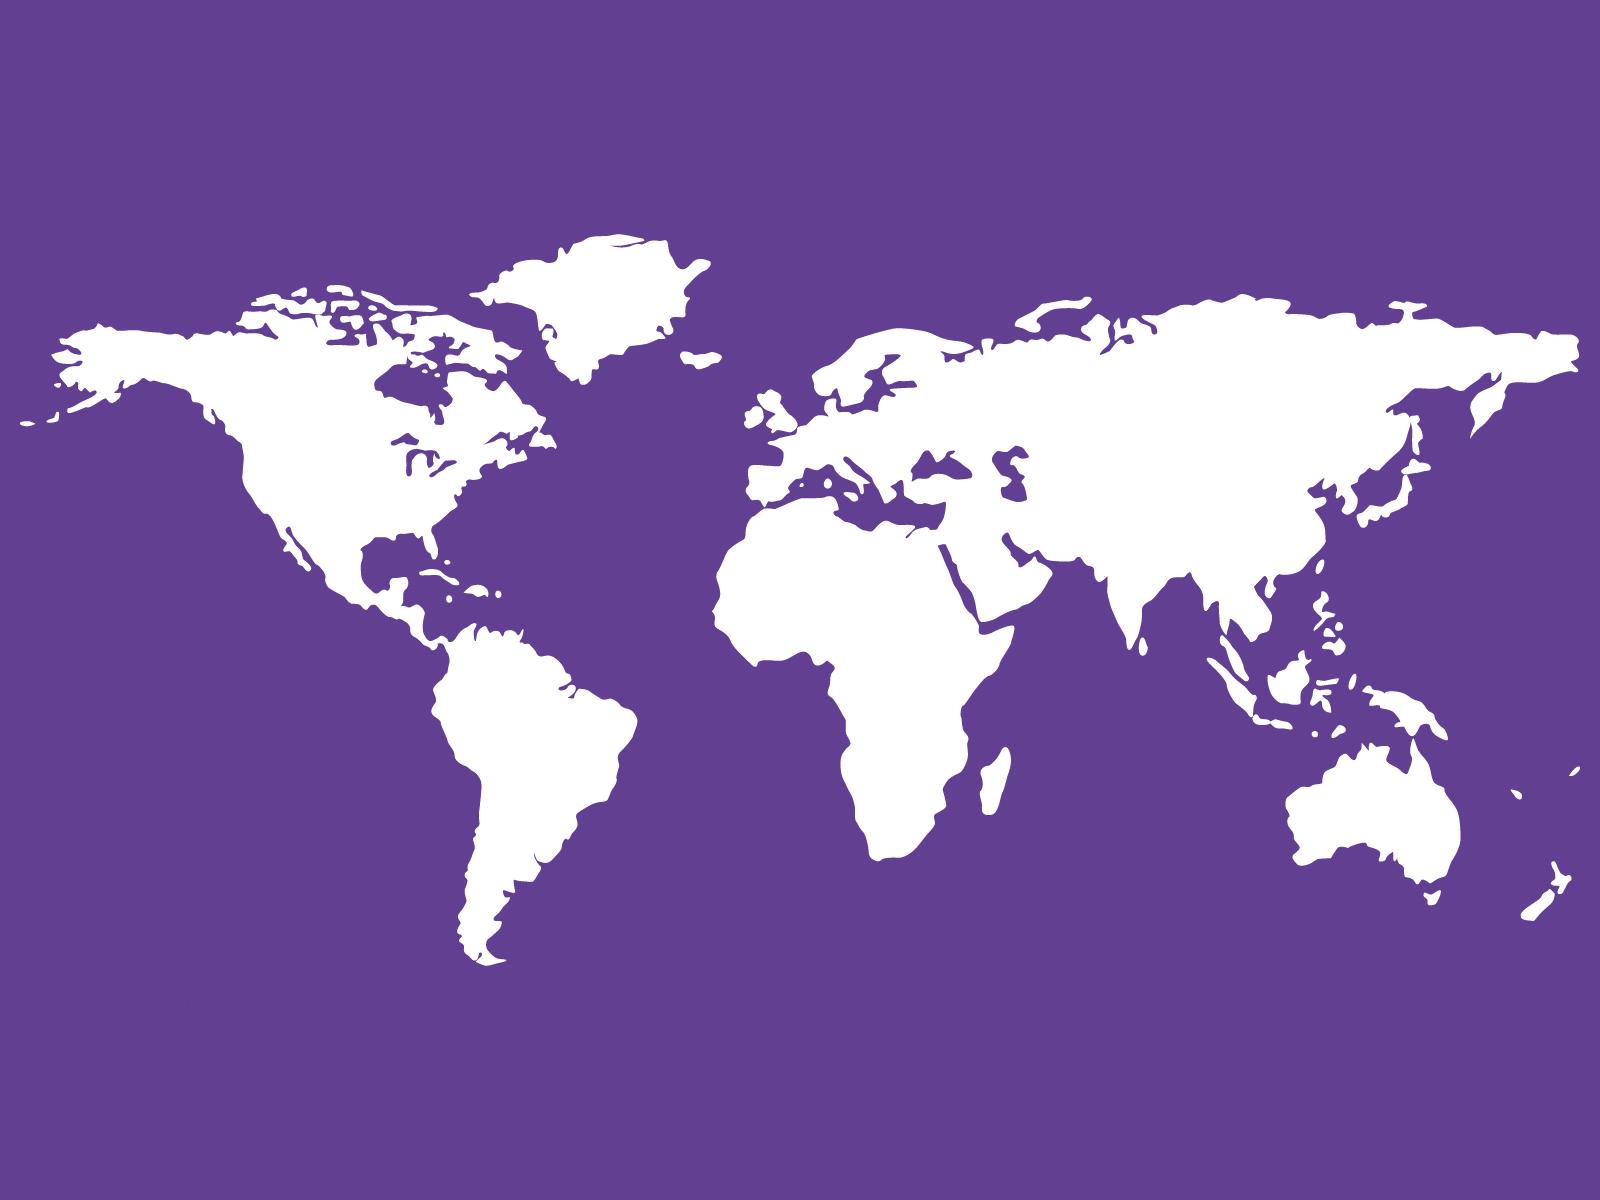 Purple world maps backgrounds business design purple templates purple world maps backgrounds gumiabroncs Choice Image